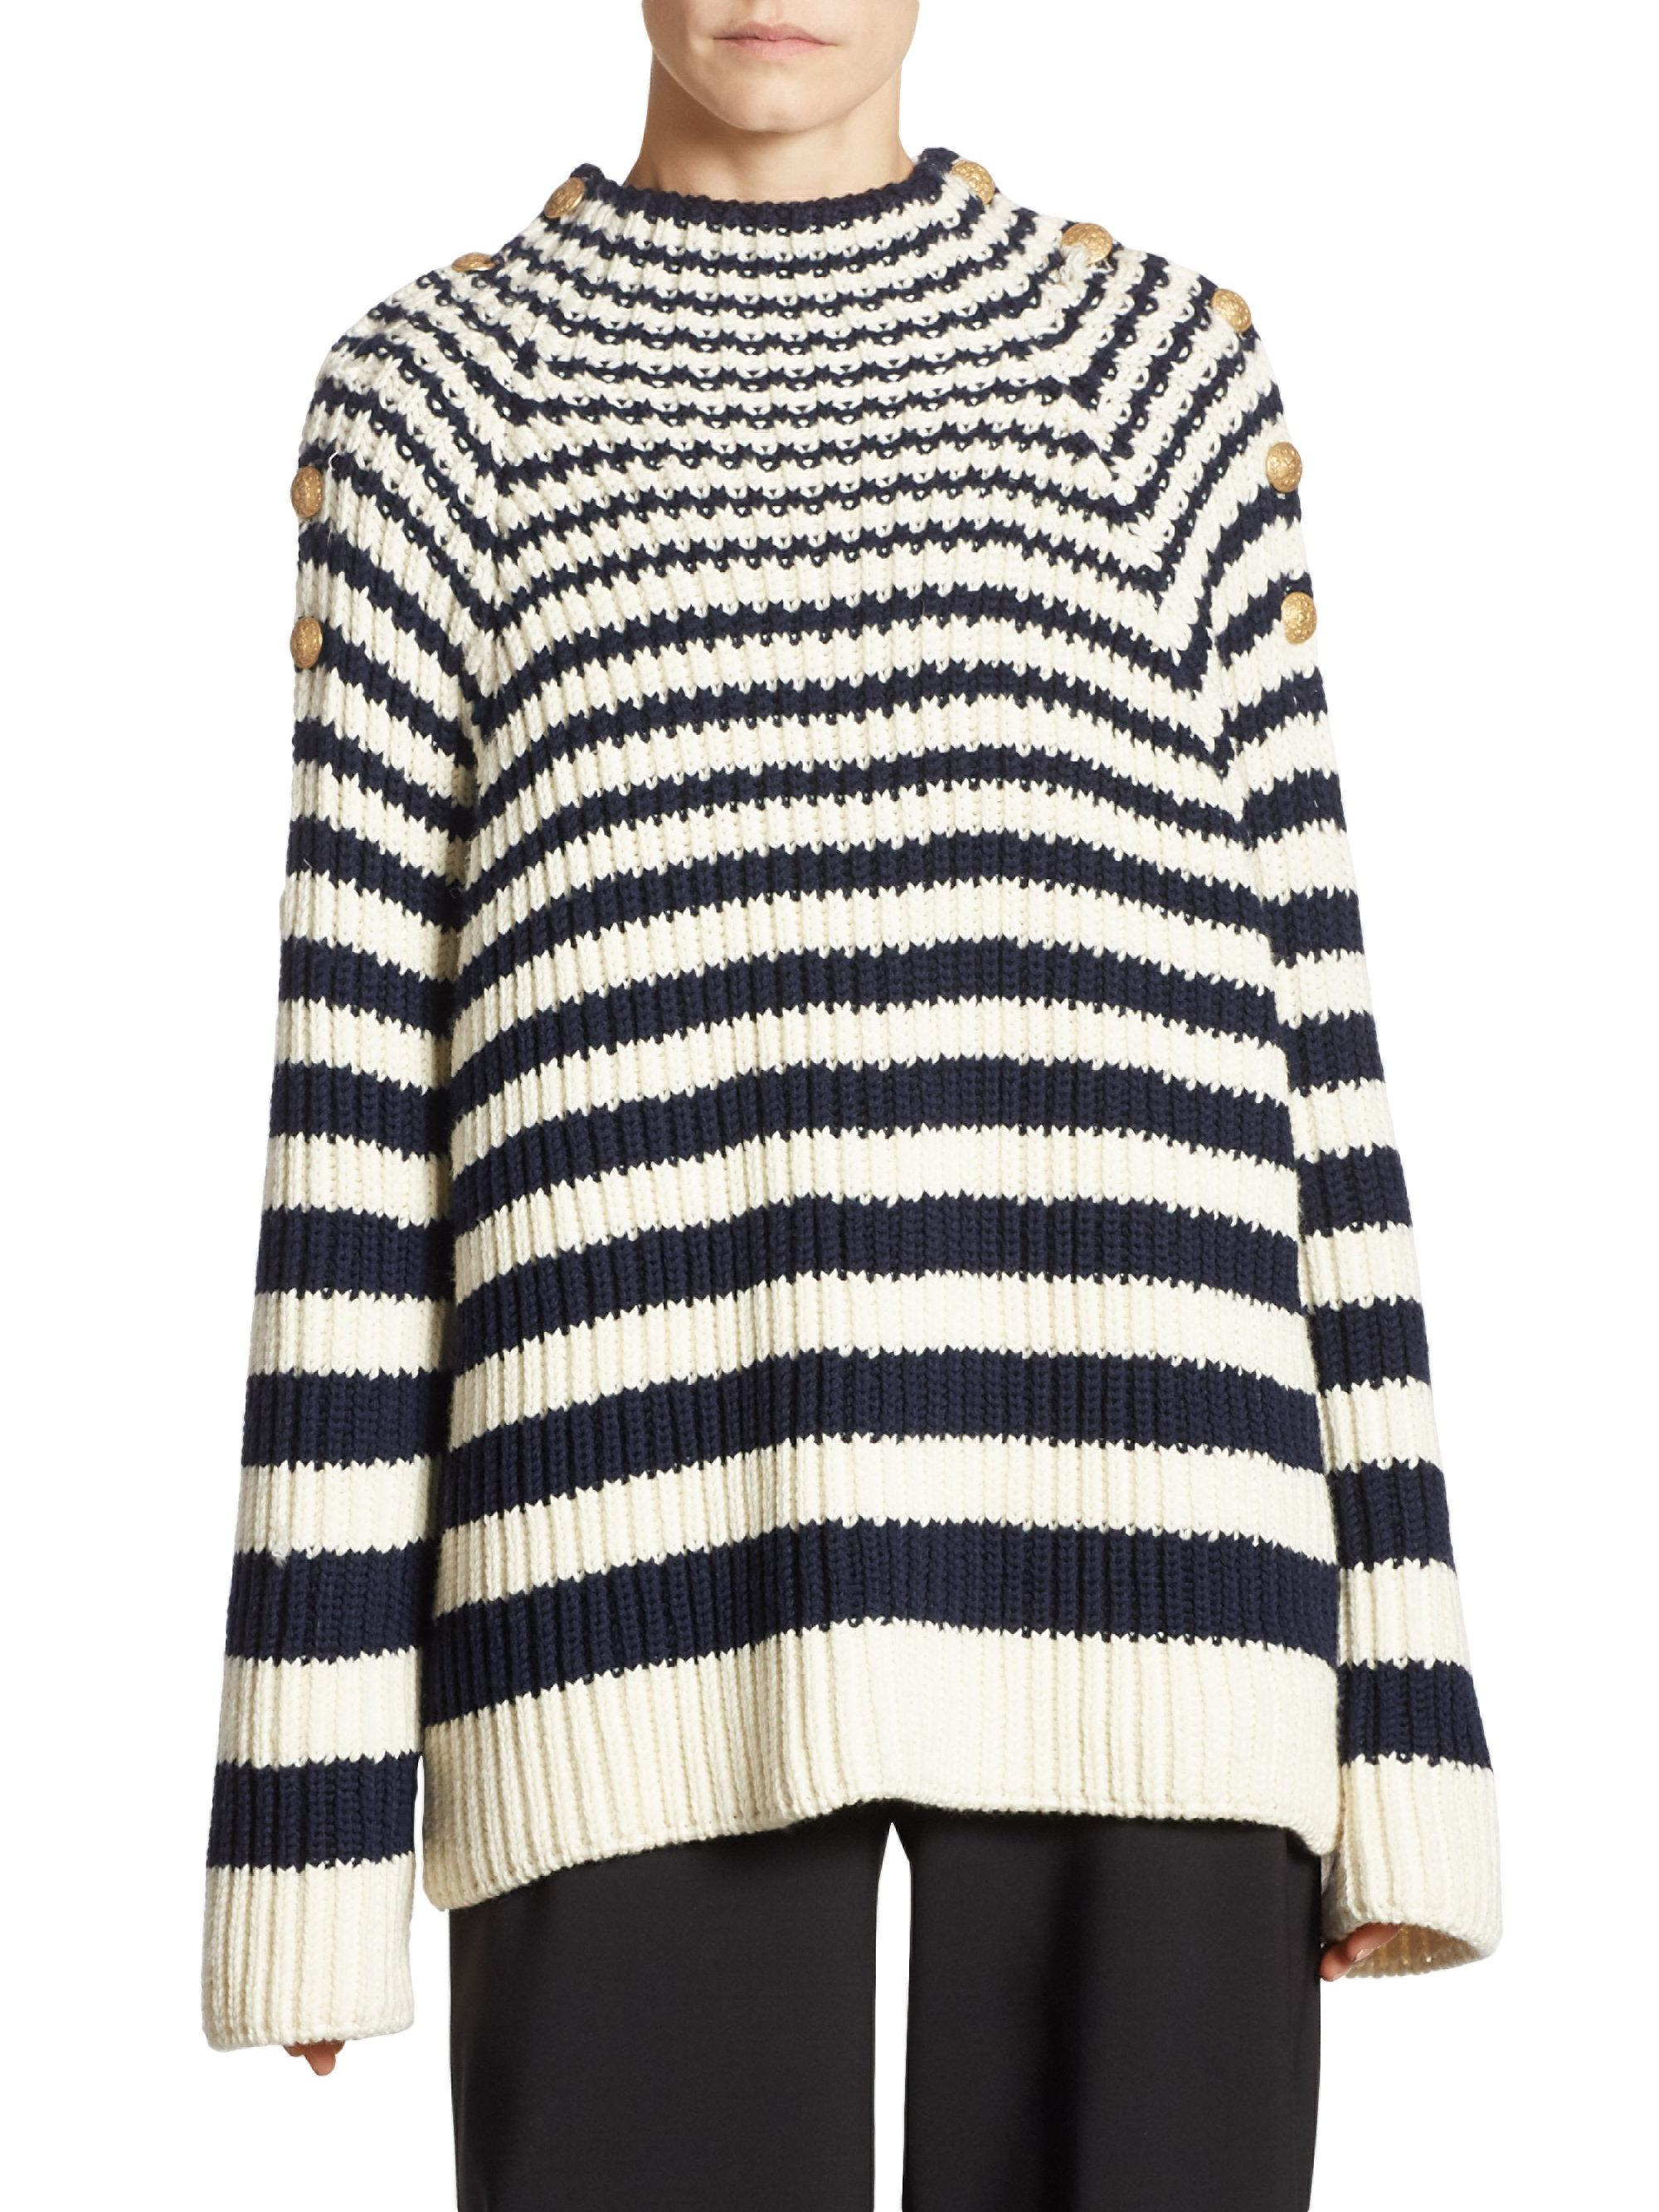 Wool Sweater Grey: Alberta Ferretti Striped Wool Sweater In Blue